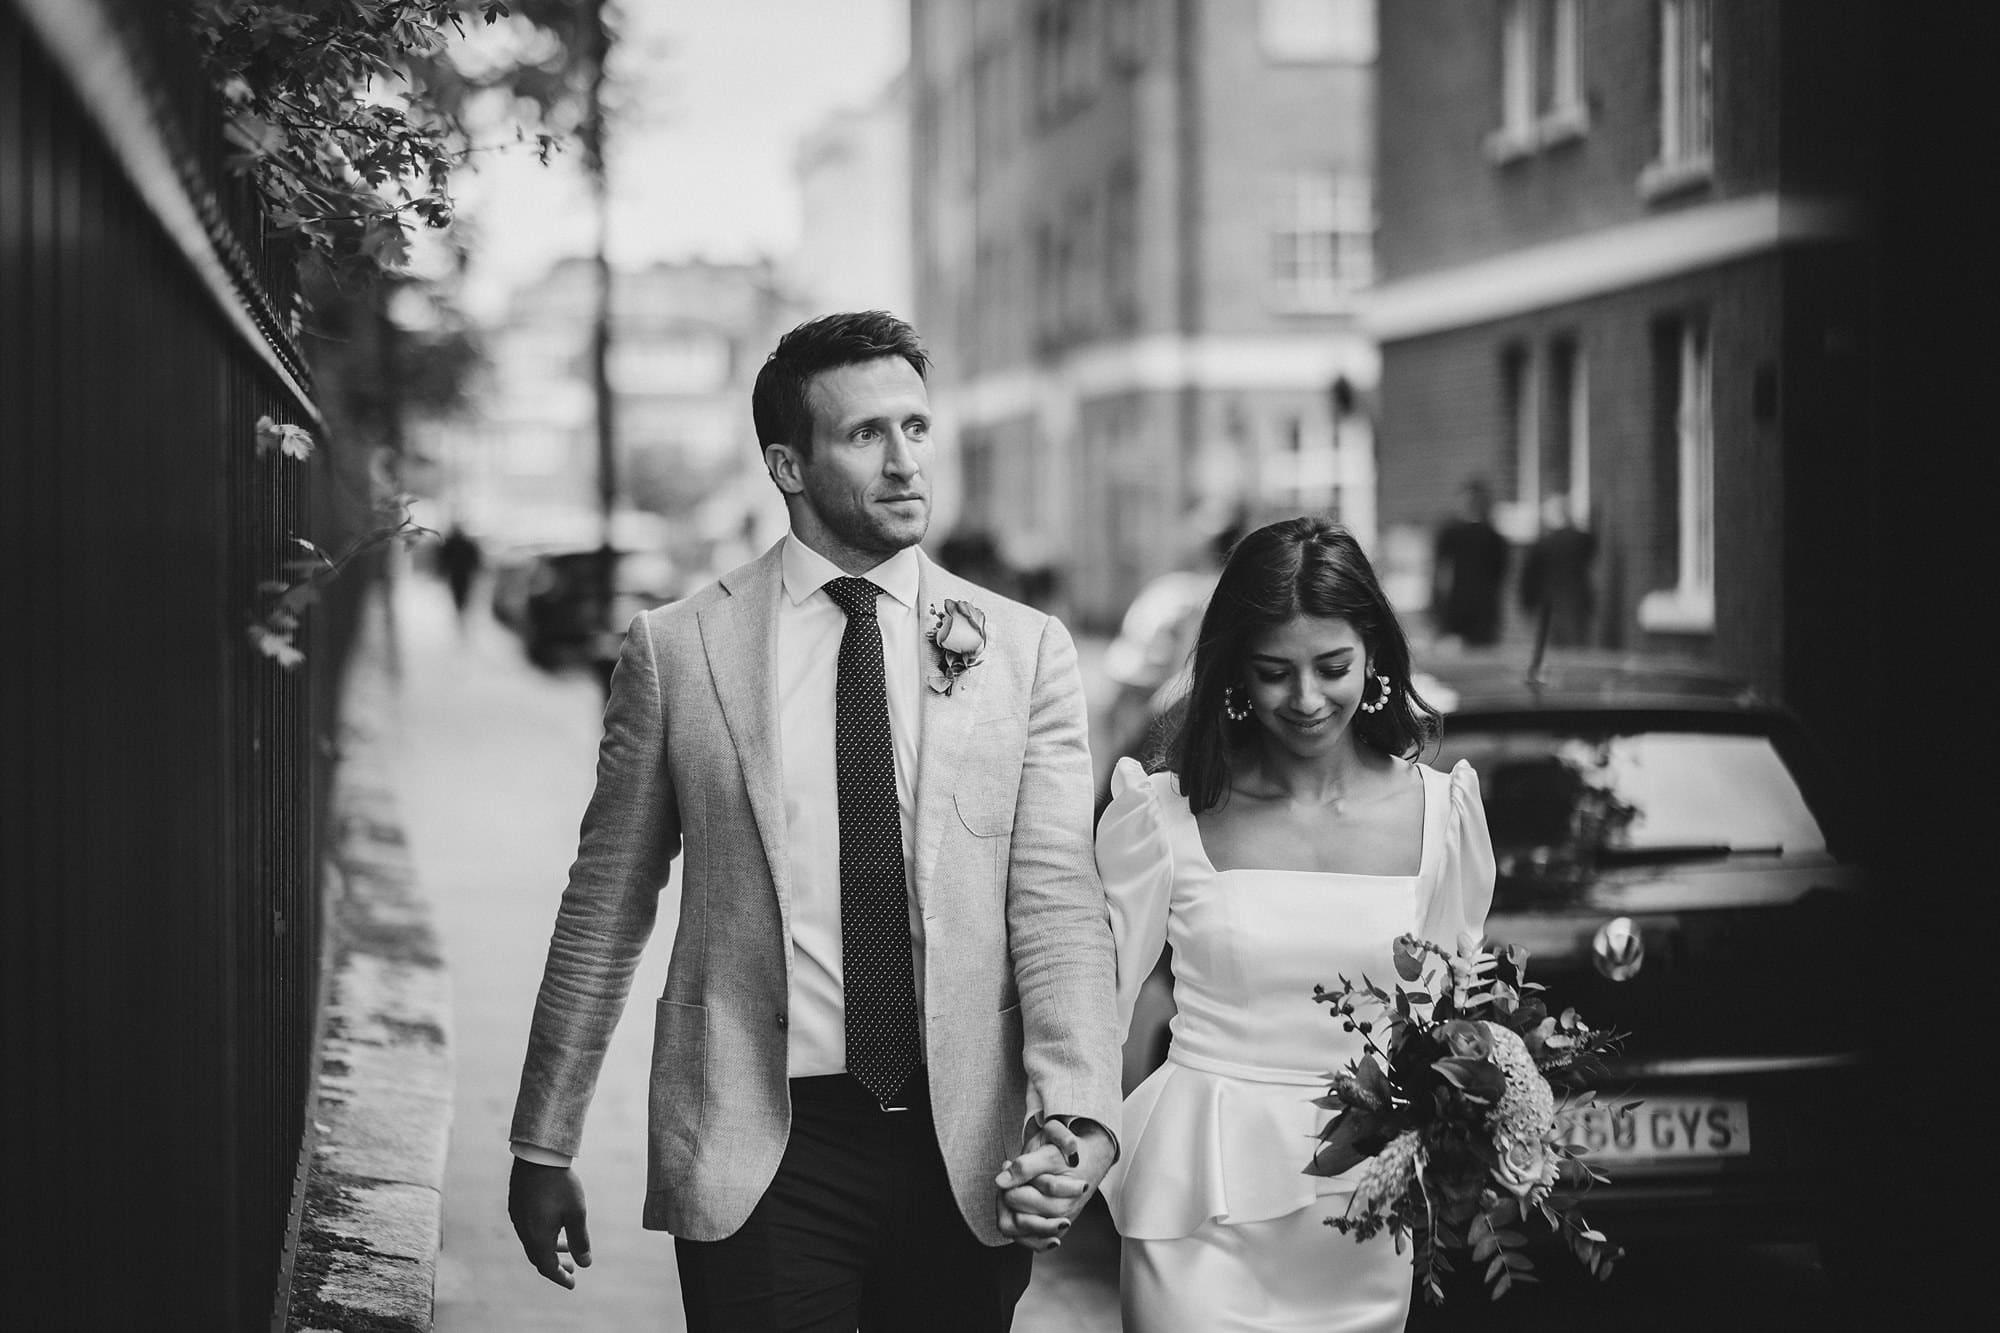 chelsea old town hall wedding photographer te 090 - Tara + Ed